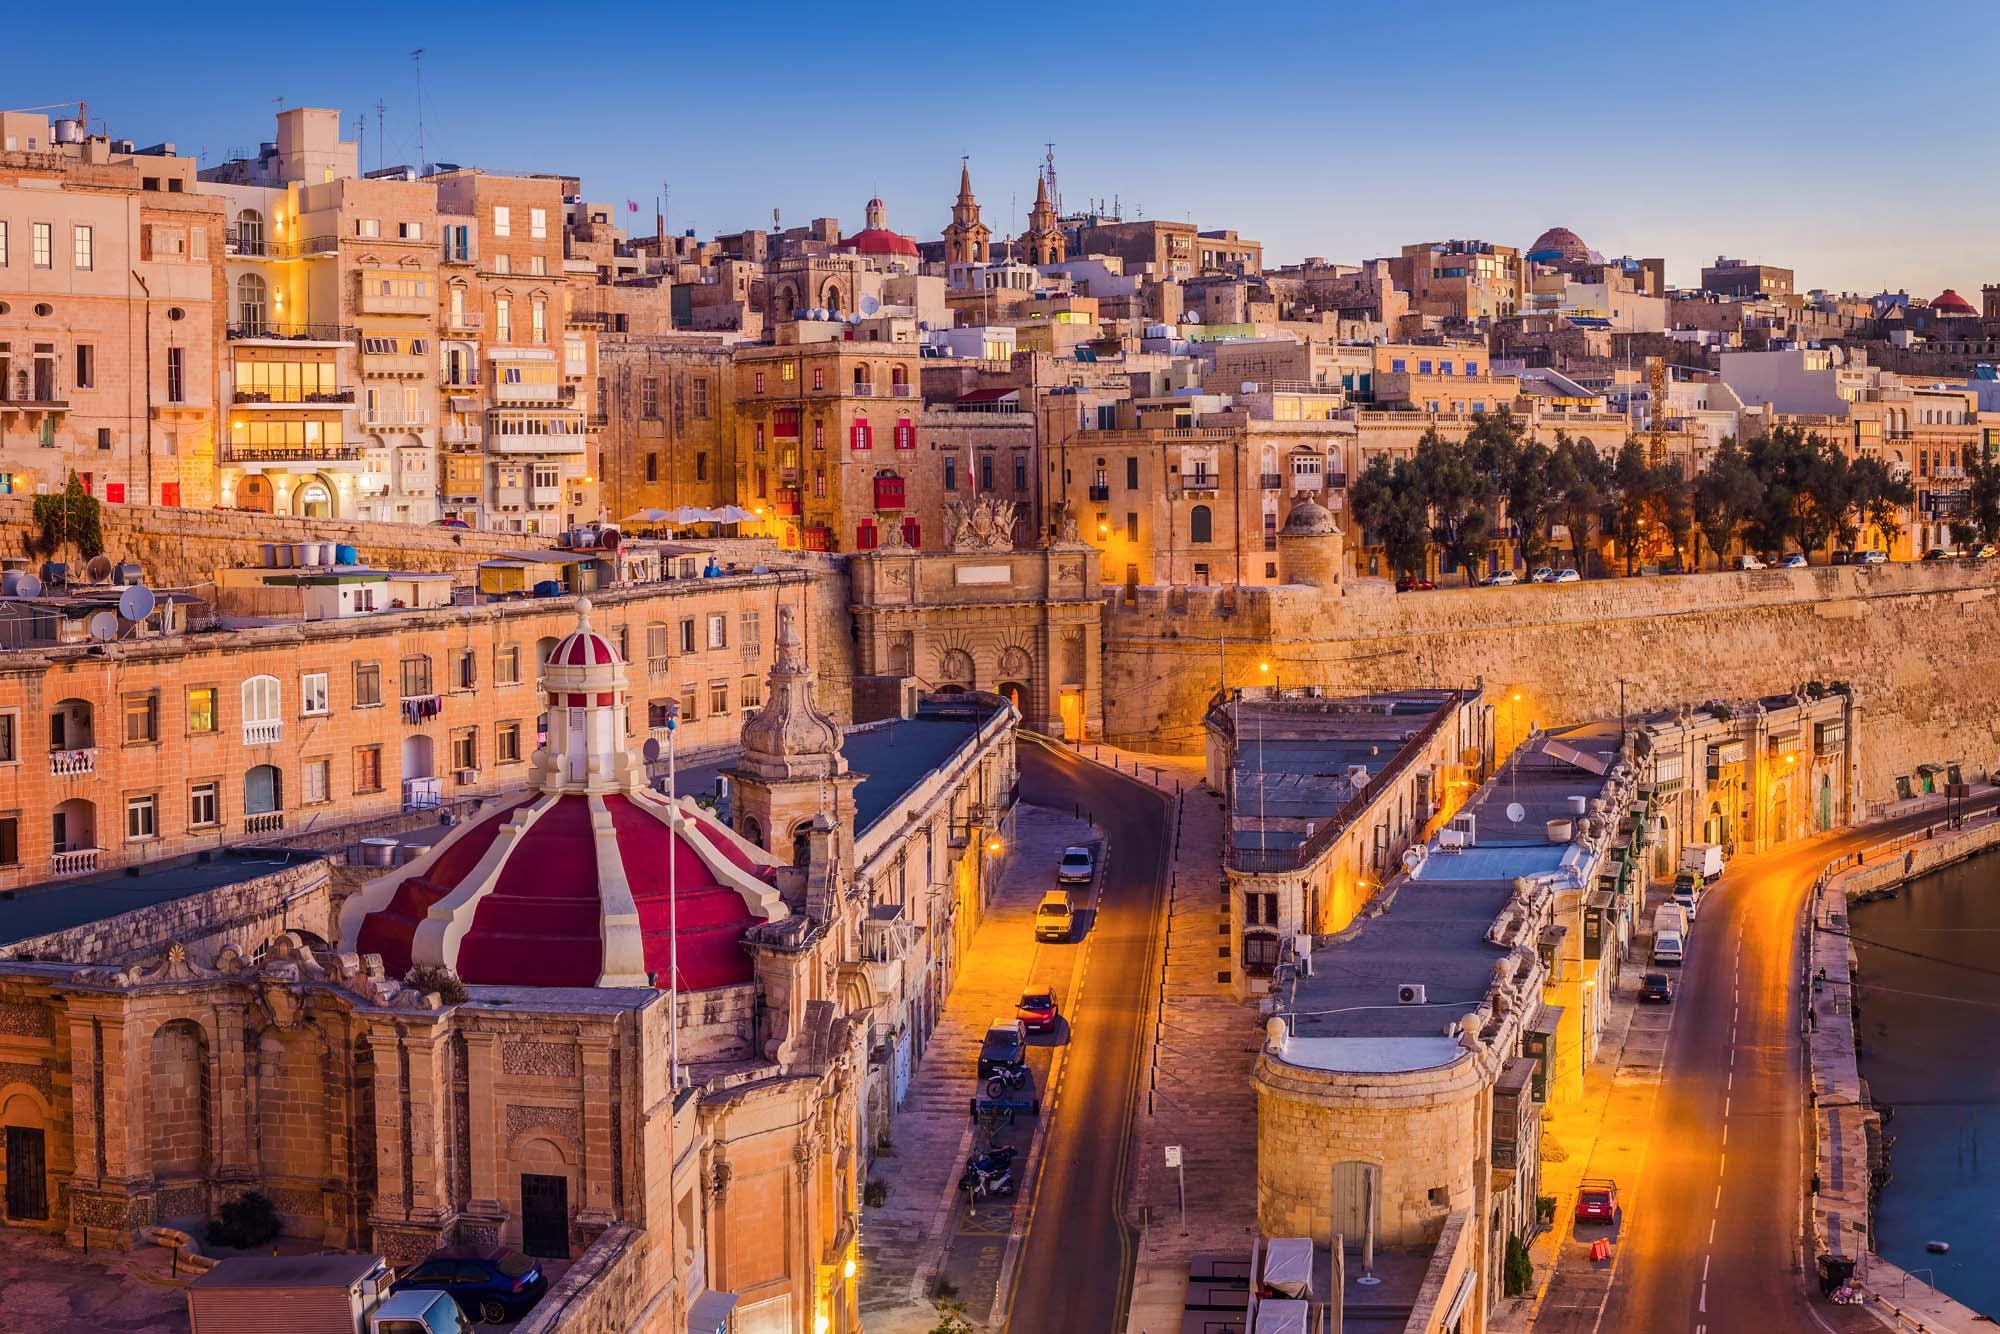 Malta eid summer travel destination ideas